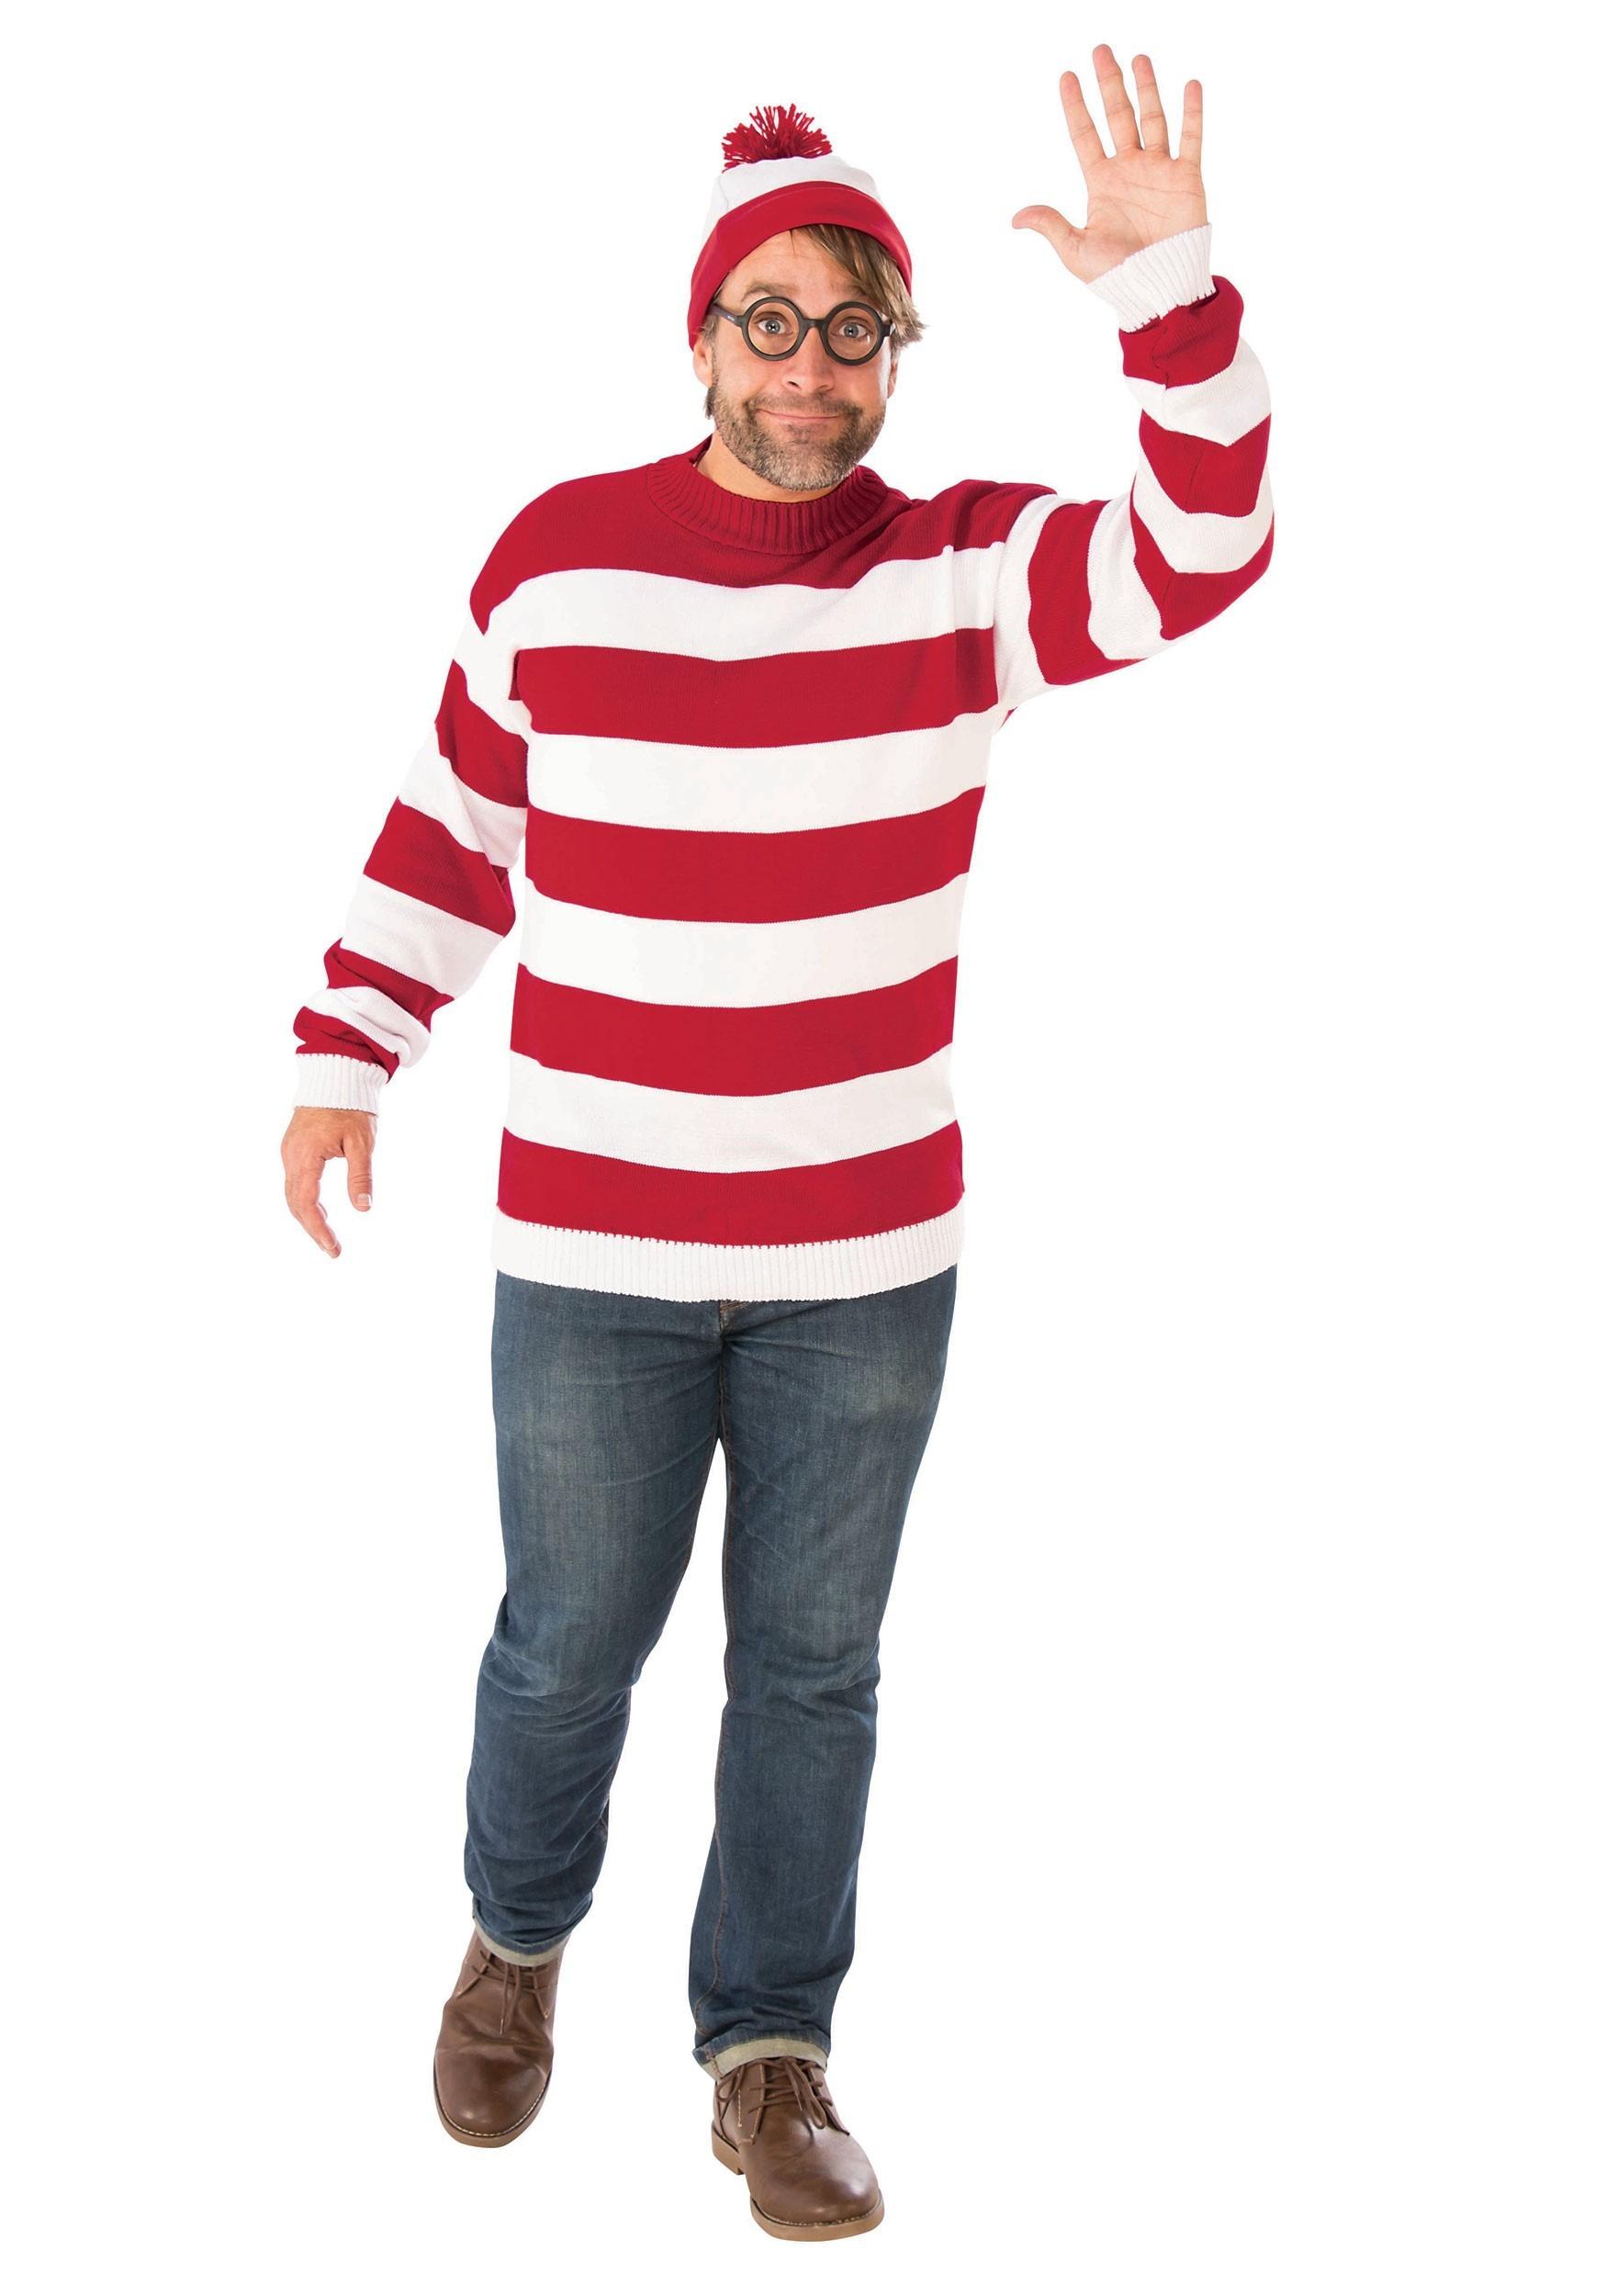 Marty McFly | Wheres wally fancy dress, Adult fancy dress ...  |Waldo 90s Halloween Costumes For Women